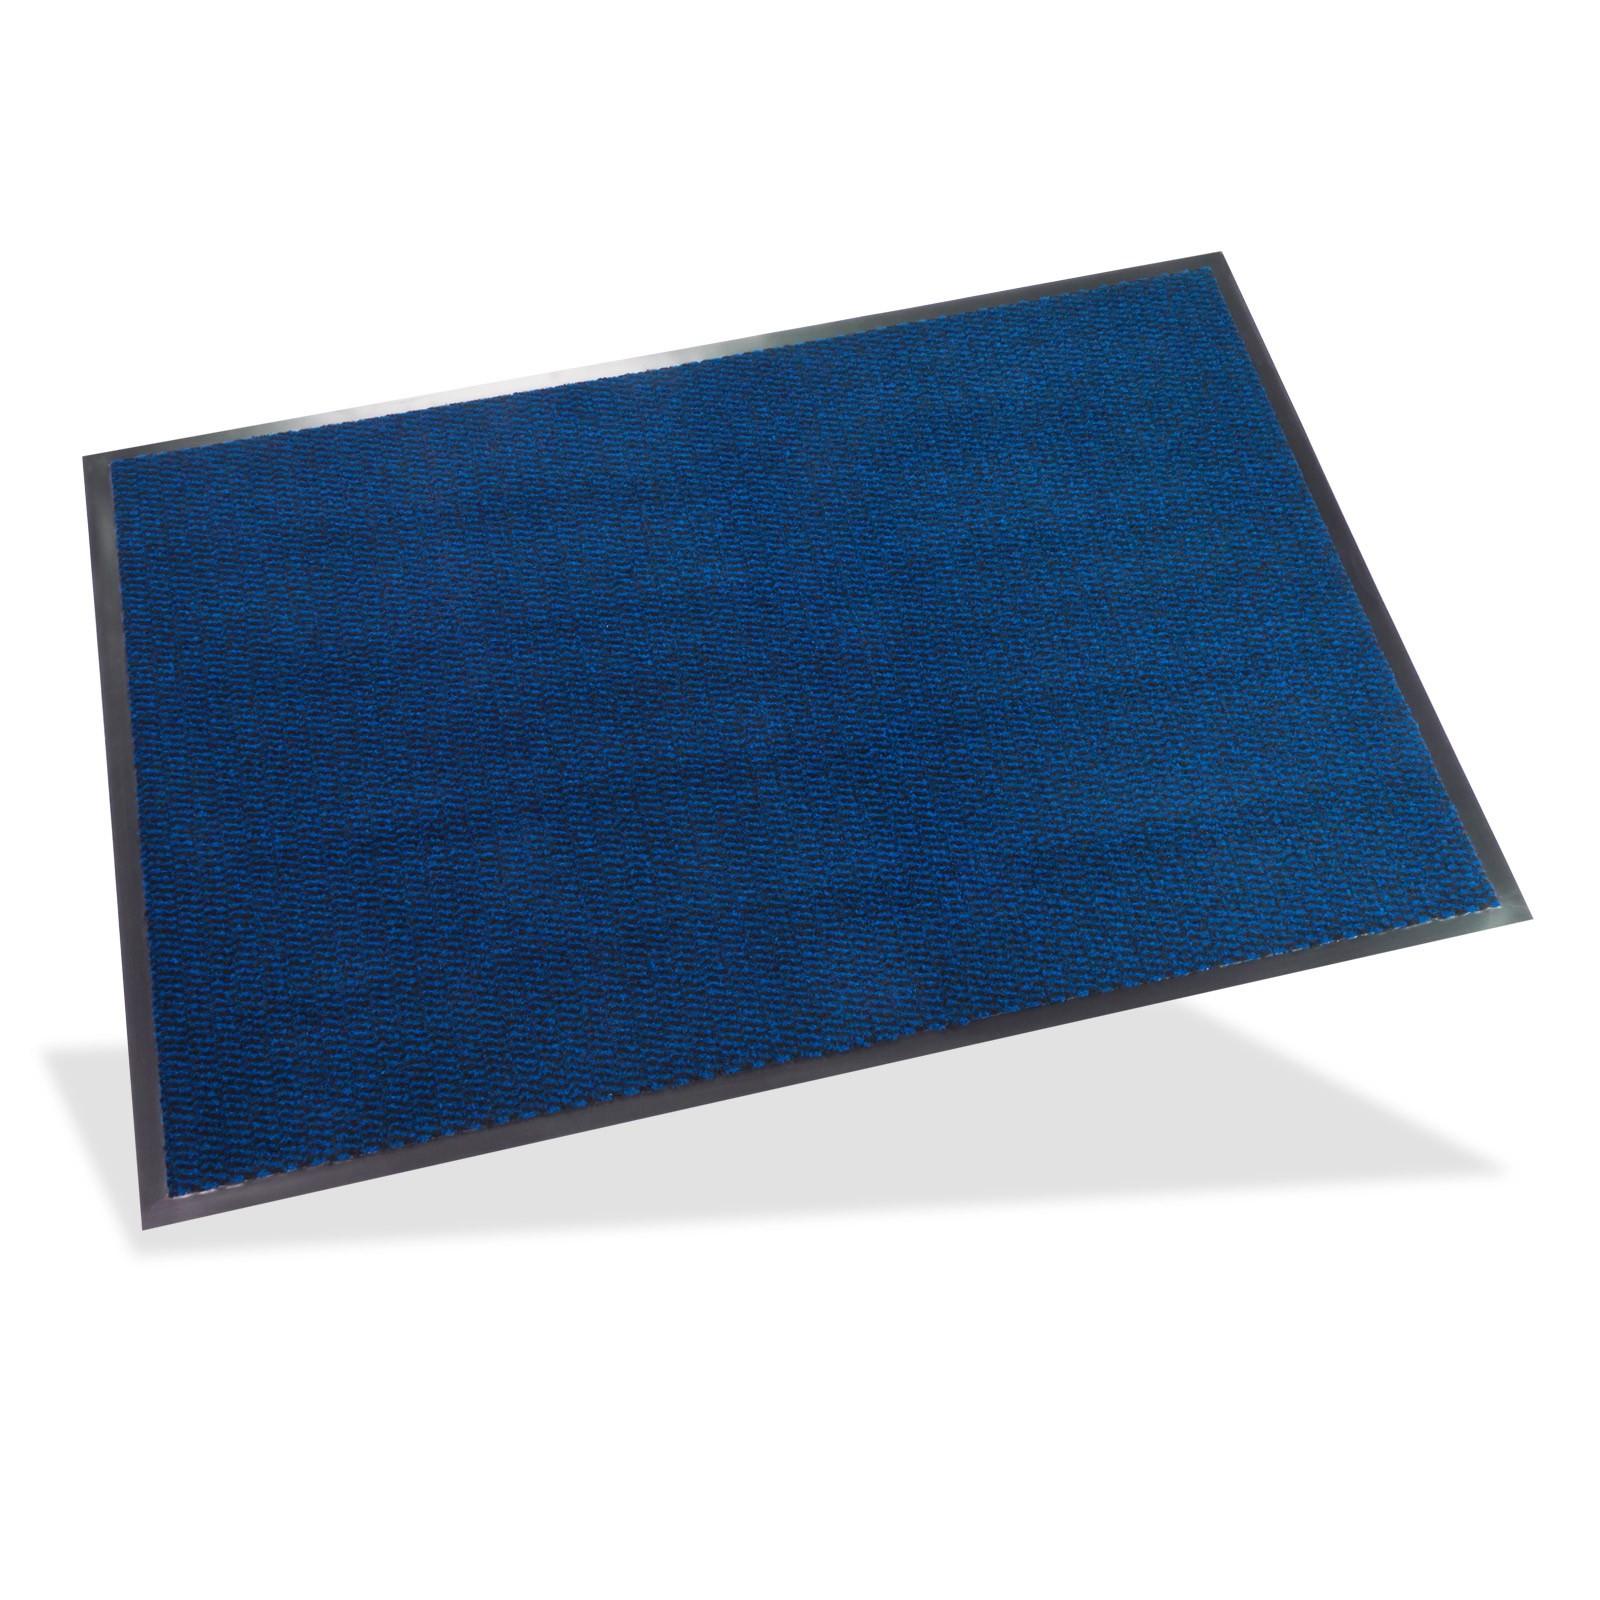 schmutzfangmatte fu matte spektrum 80x120 cm blau. Black Bedroom Furniture Sets. Home Design Ideas